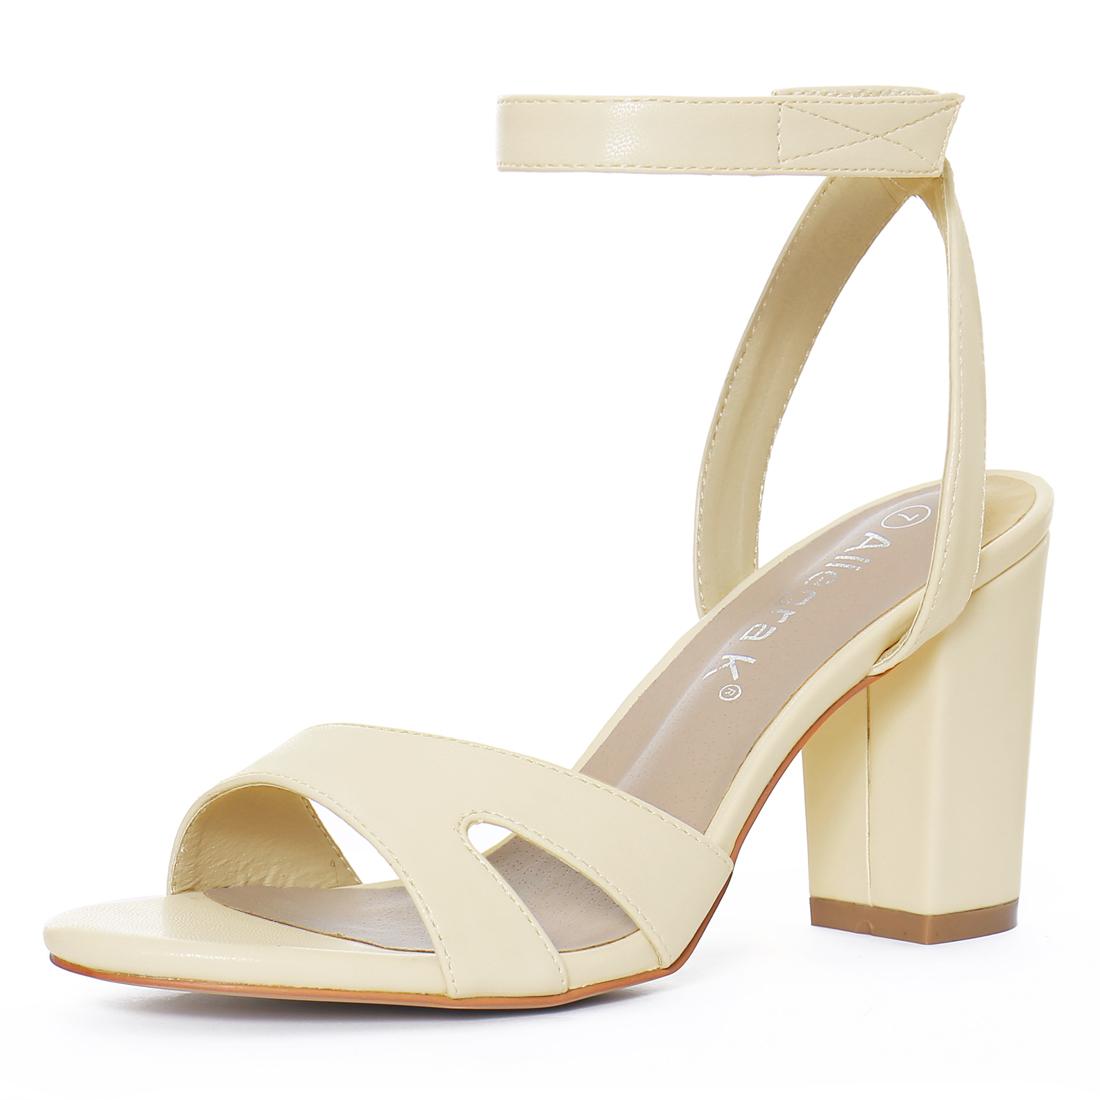 Women Open Toe Block High Heels Ankle Strap Sandals Off White US 7.5